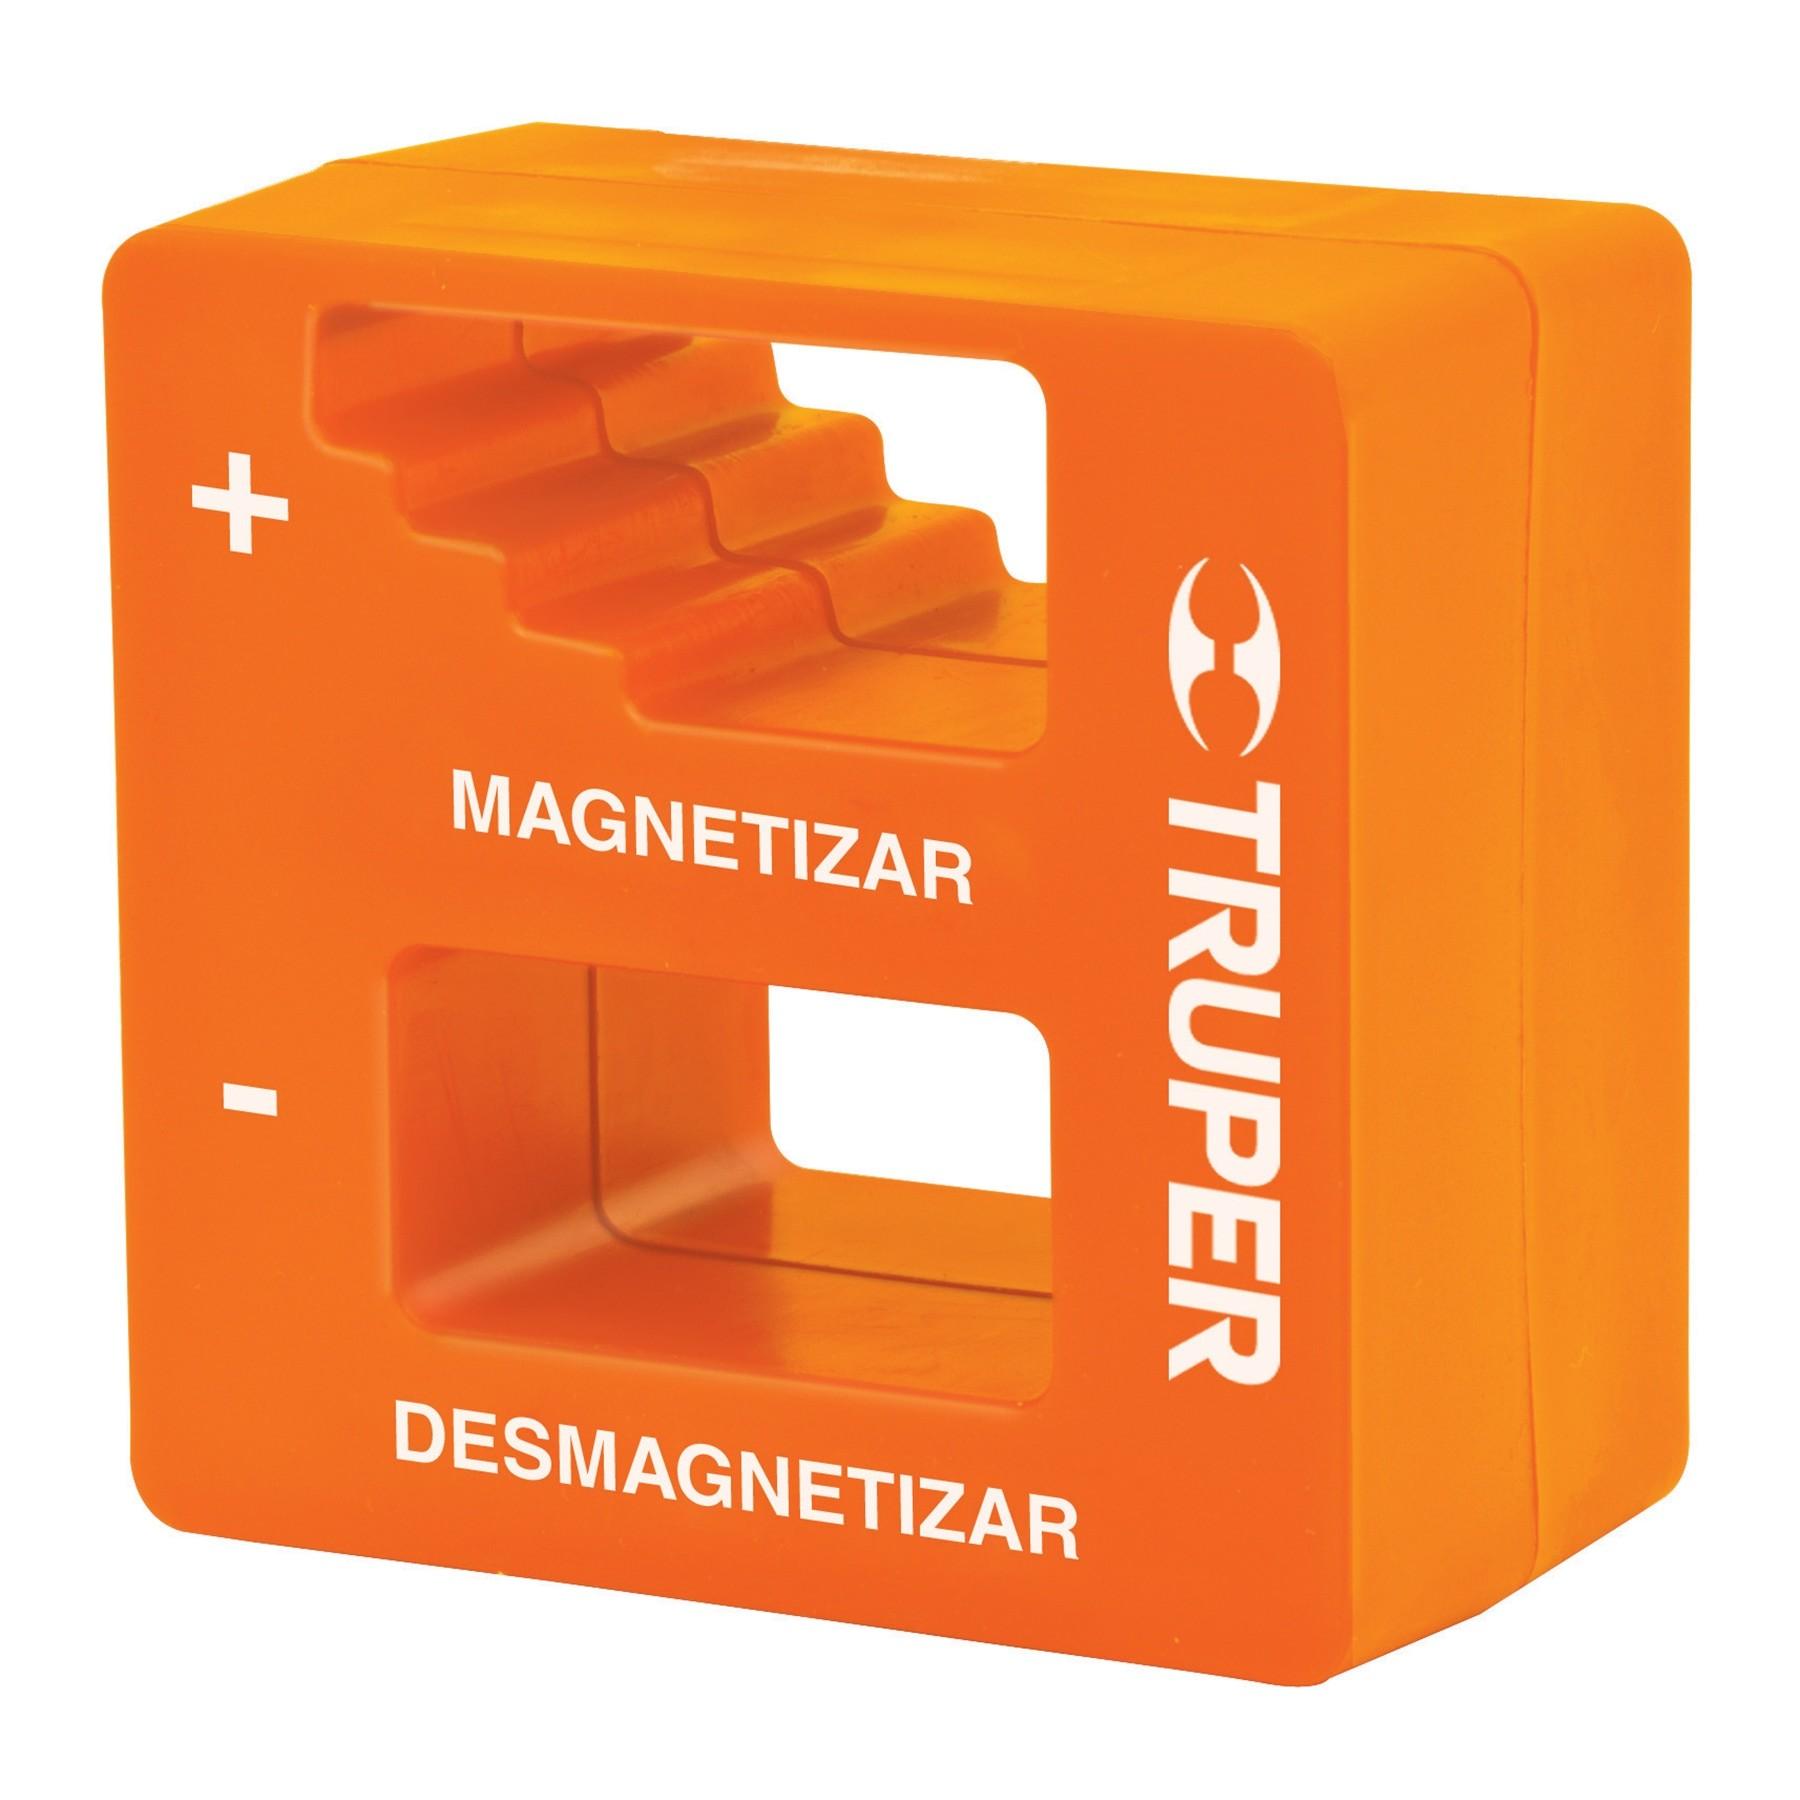 Magnetizador-desmagnetizador